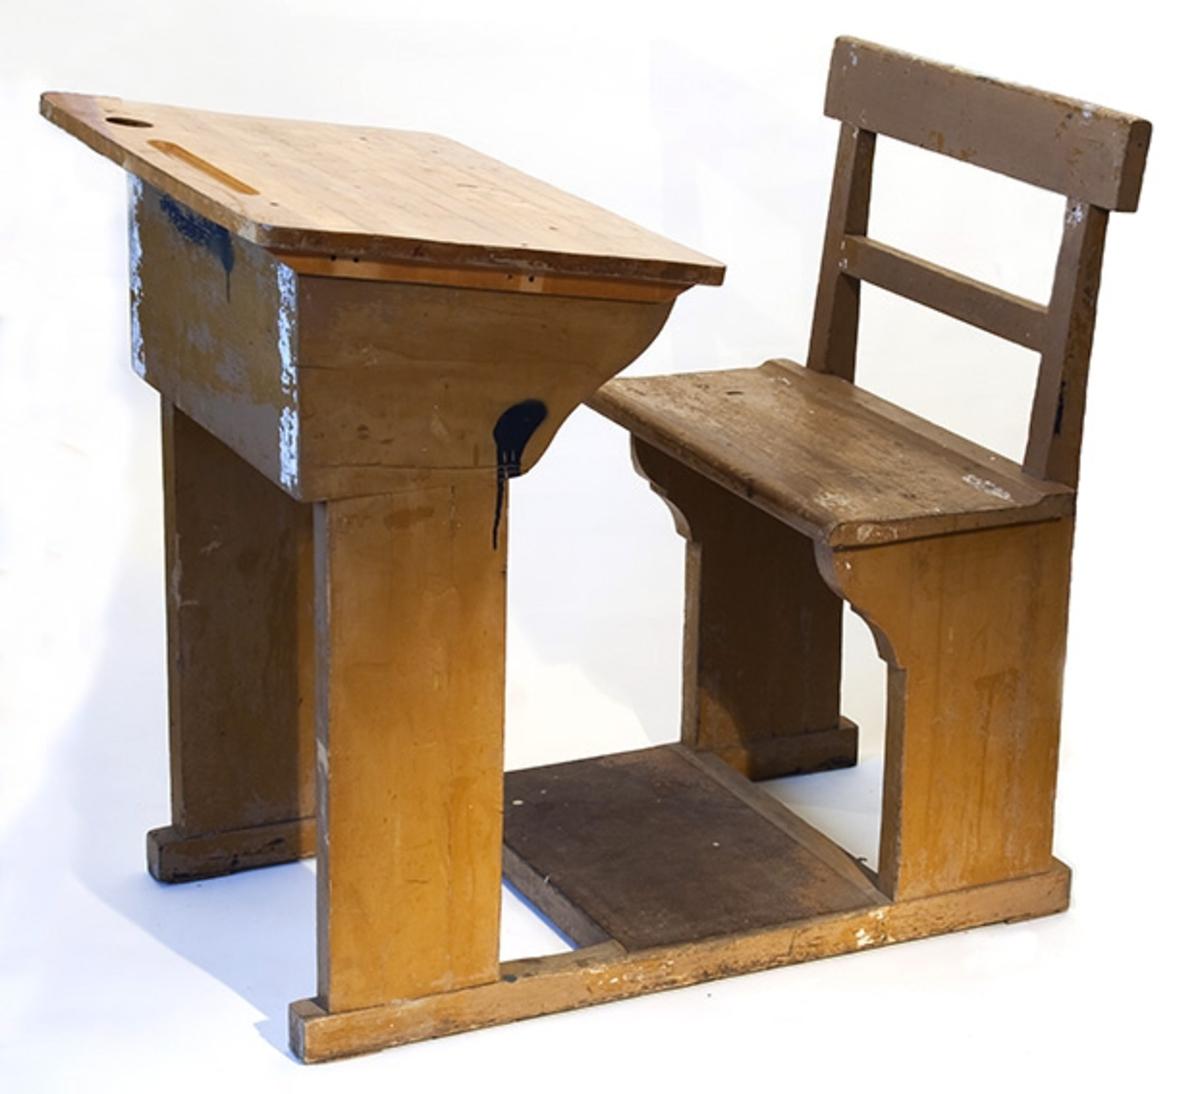 Elevpult fra Son skole. Pult for en elev, Pult og stol med fotbrett montert på to dragere.